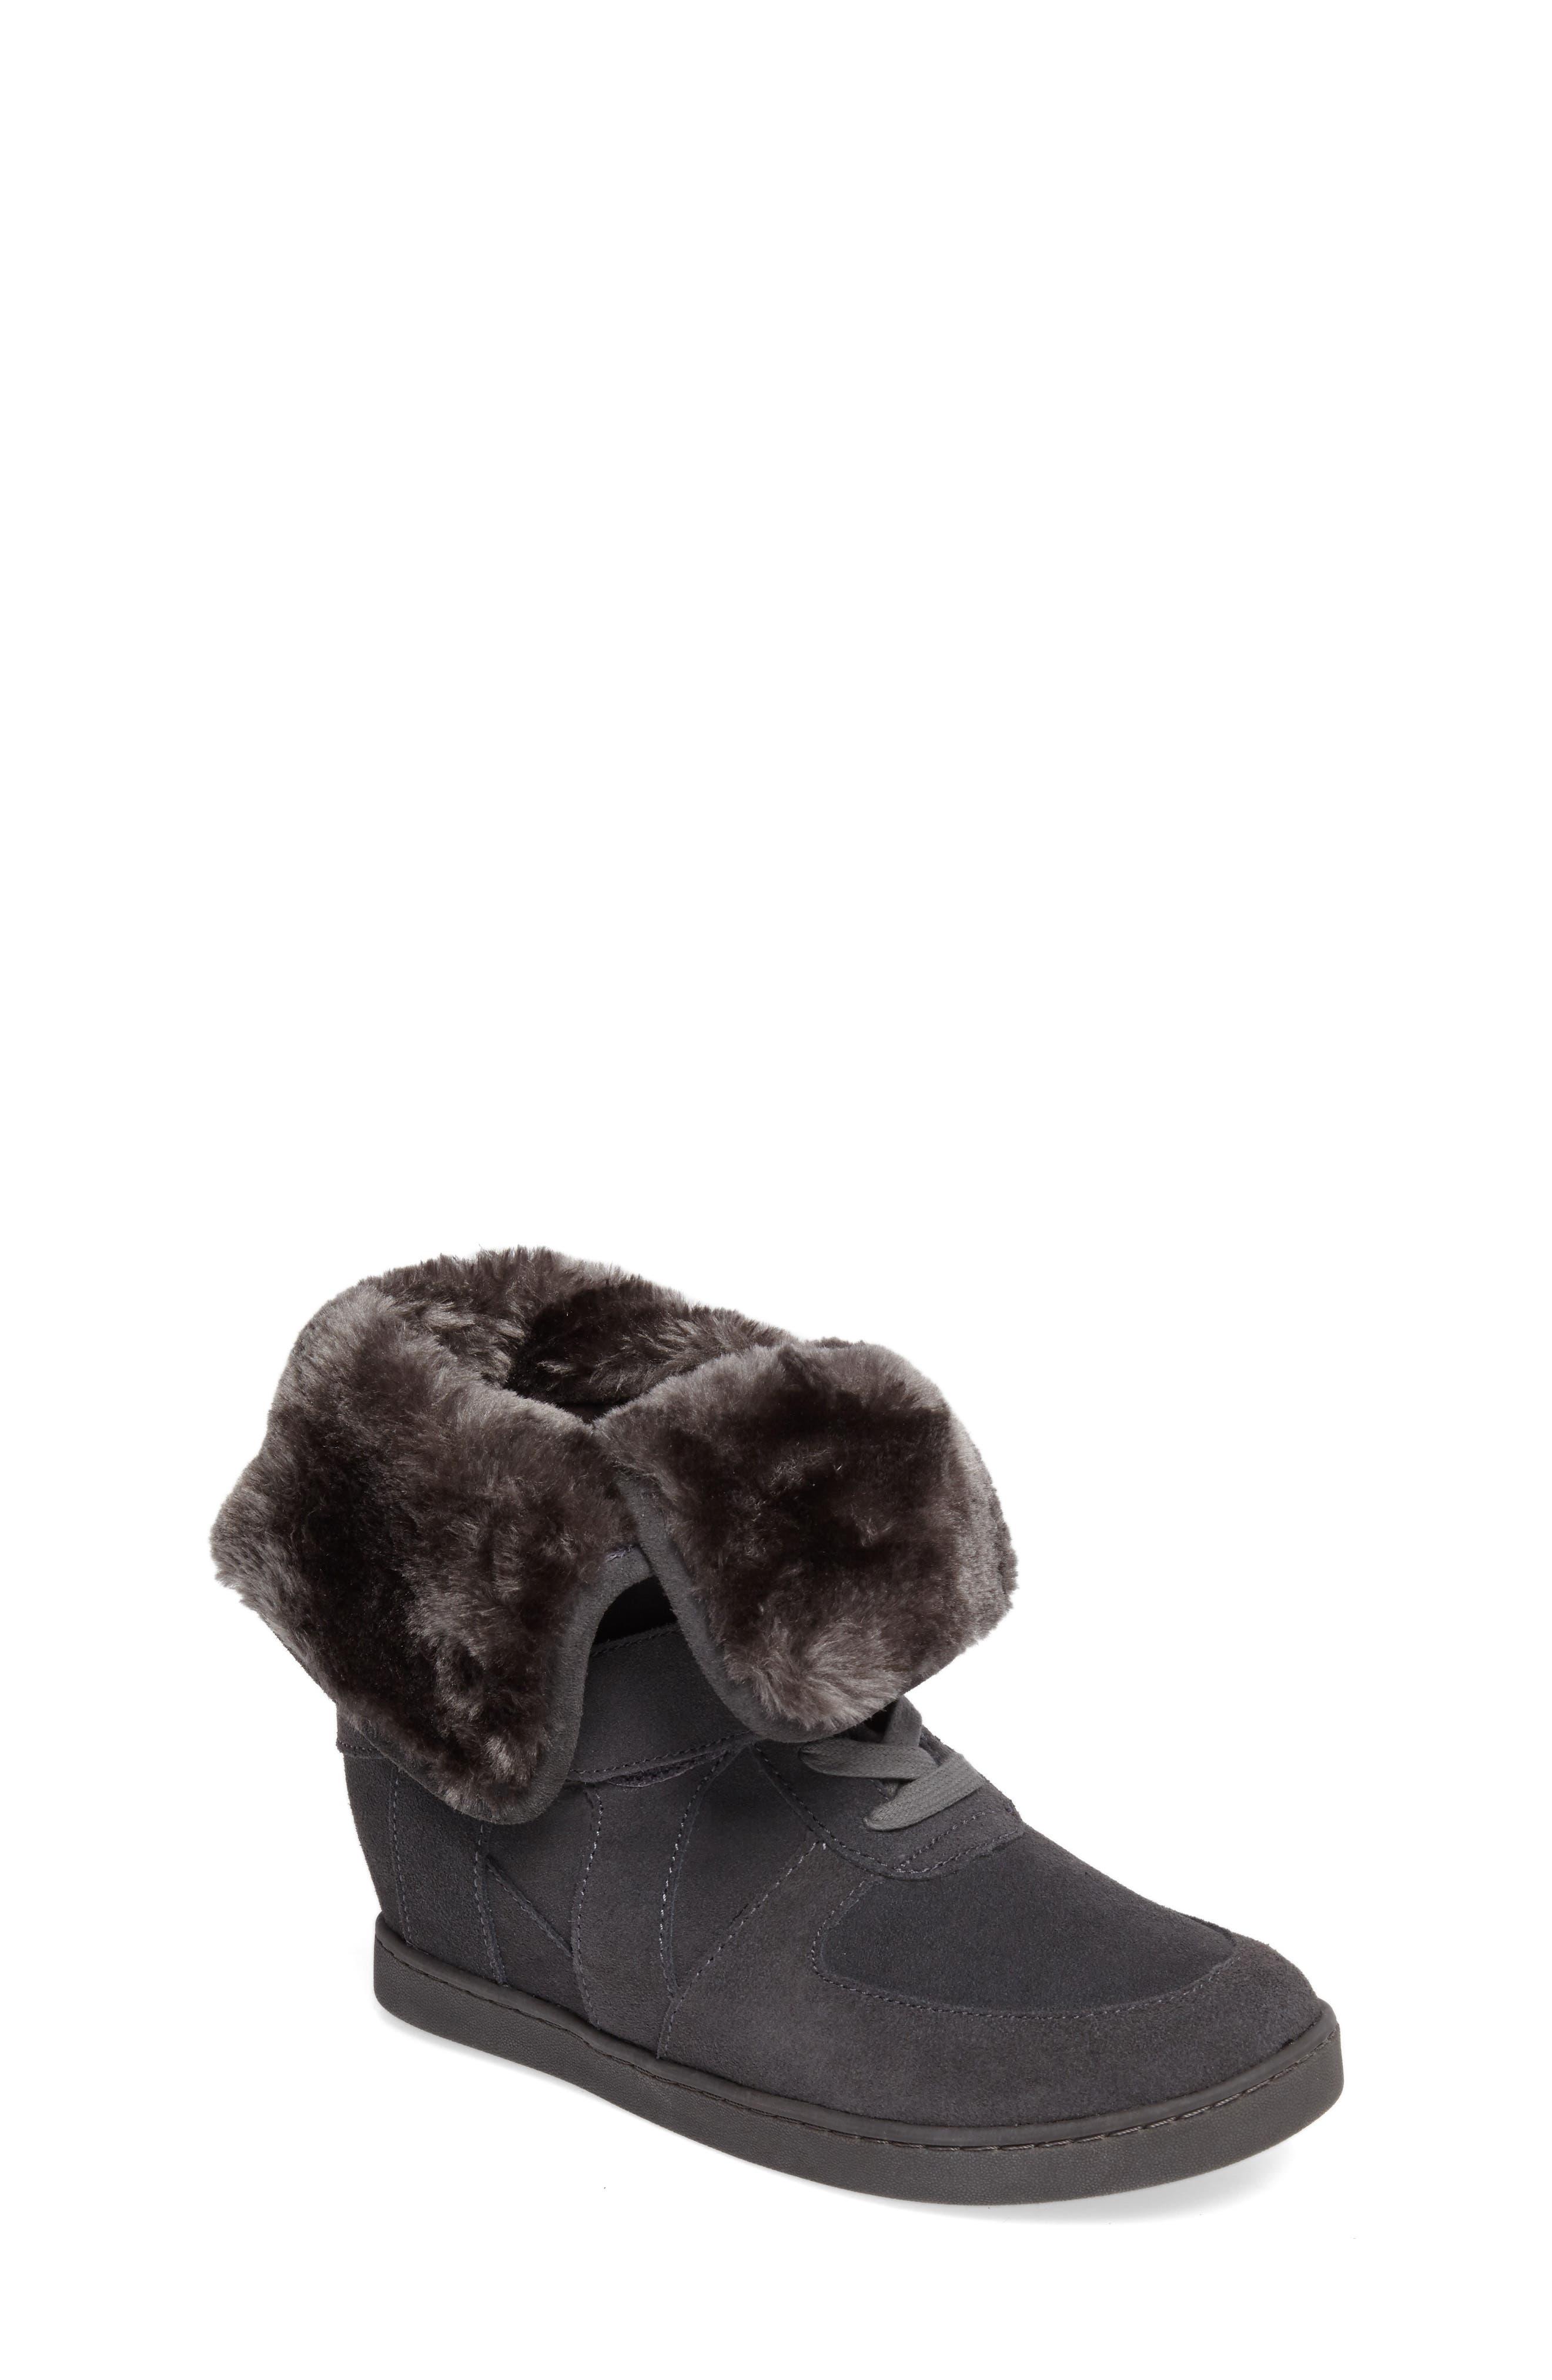 Ash Boogie Beaver Faux Fur Cuffed Bootie (Toddler, Little Kid & Big Kid)